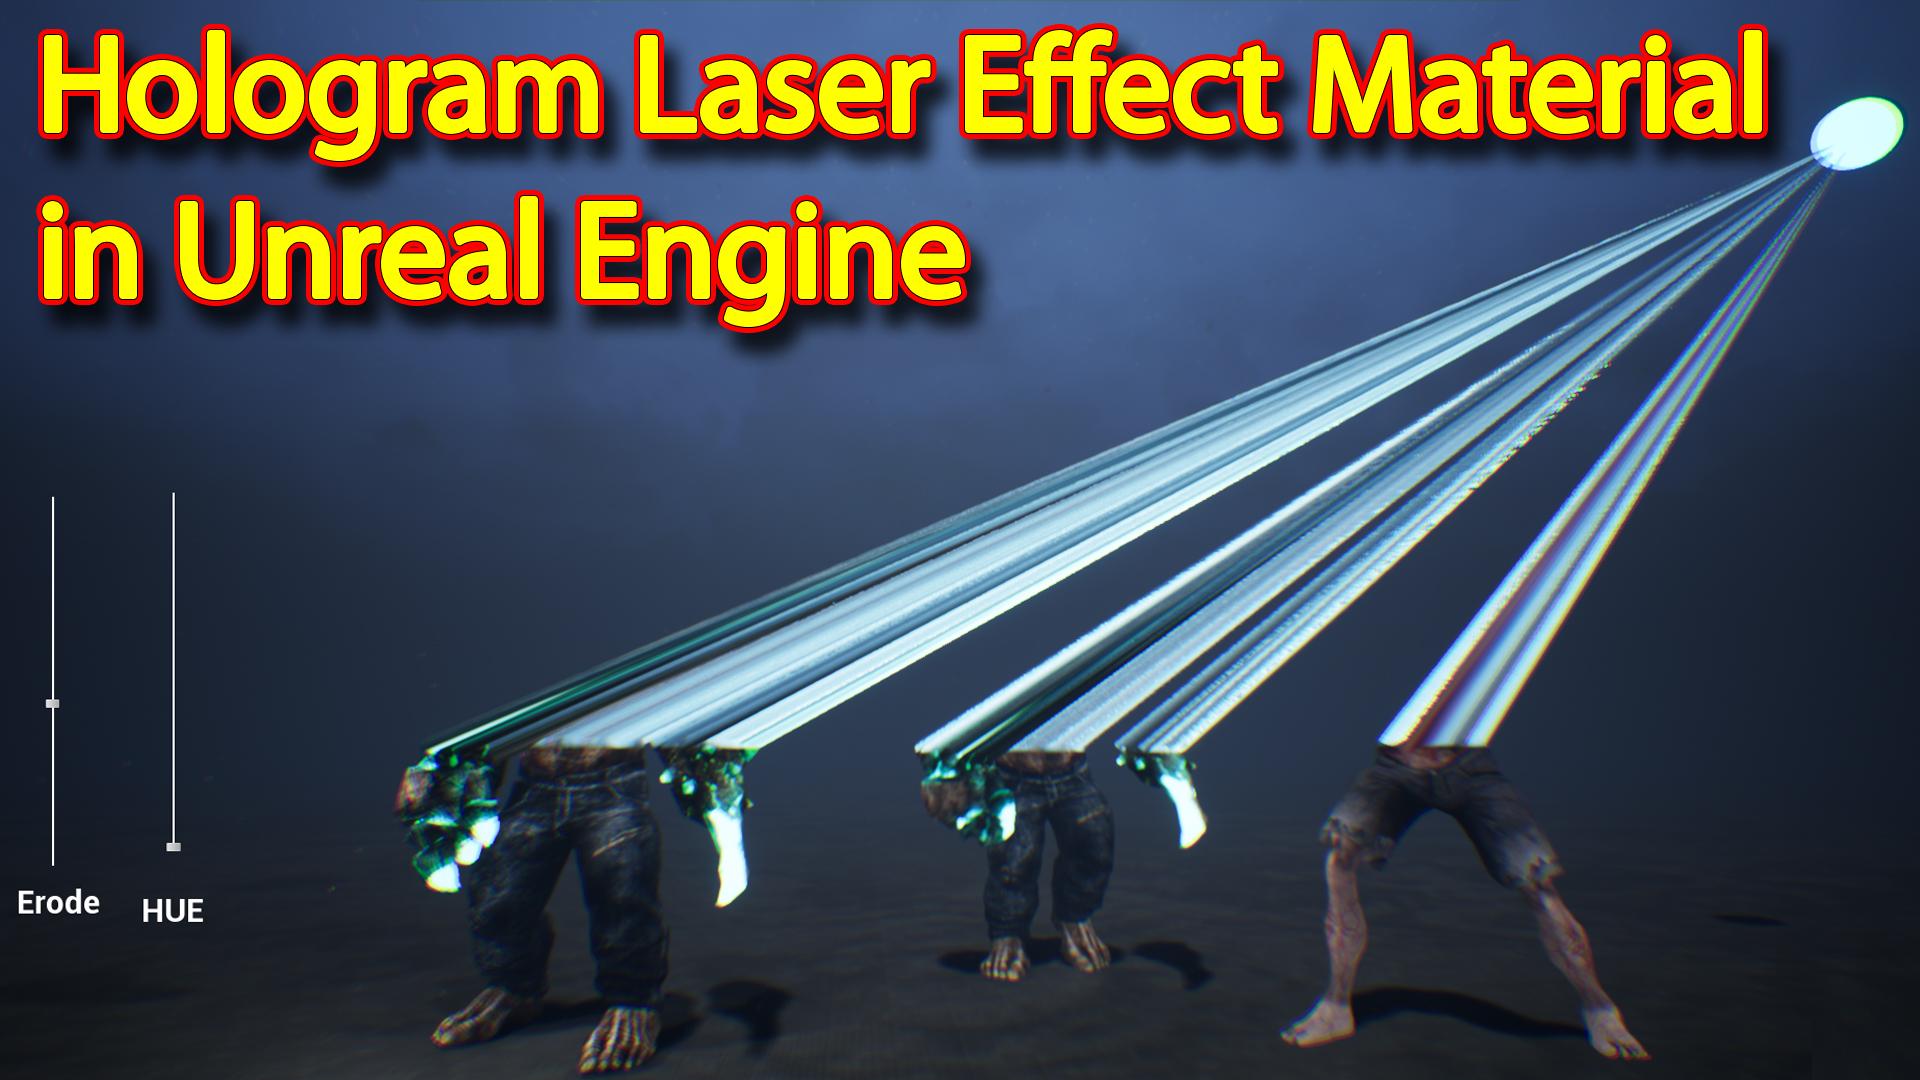 Hologram Laser Effect Material in Unreal Engine